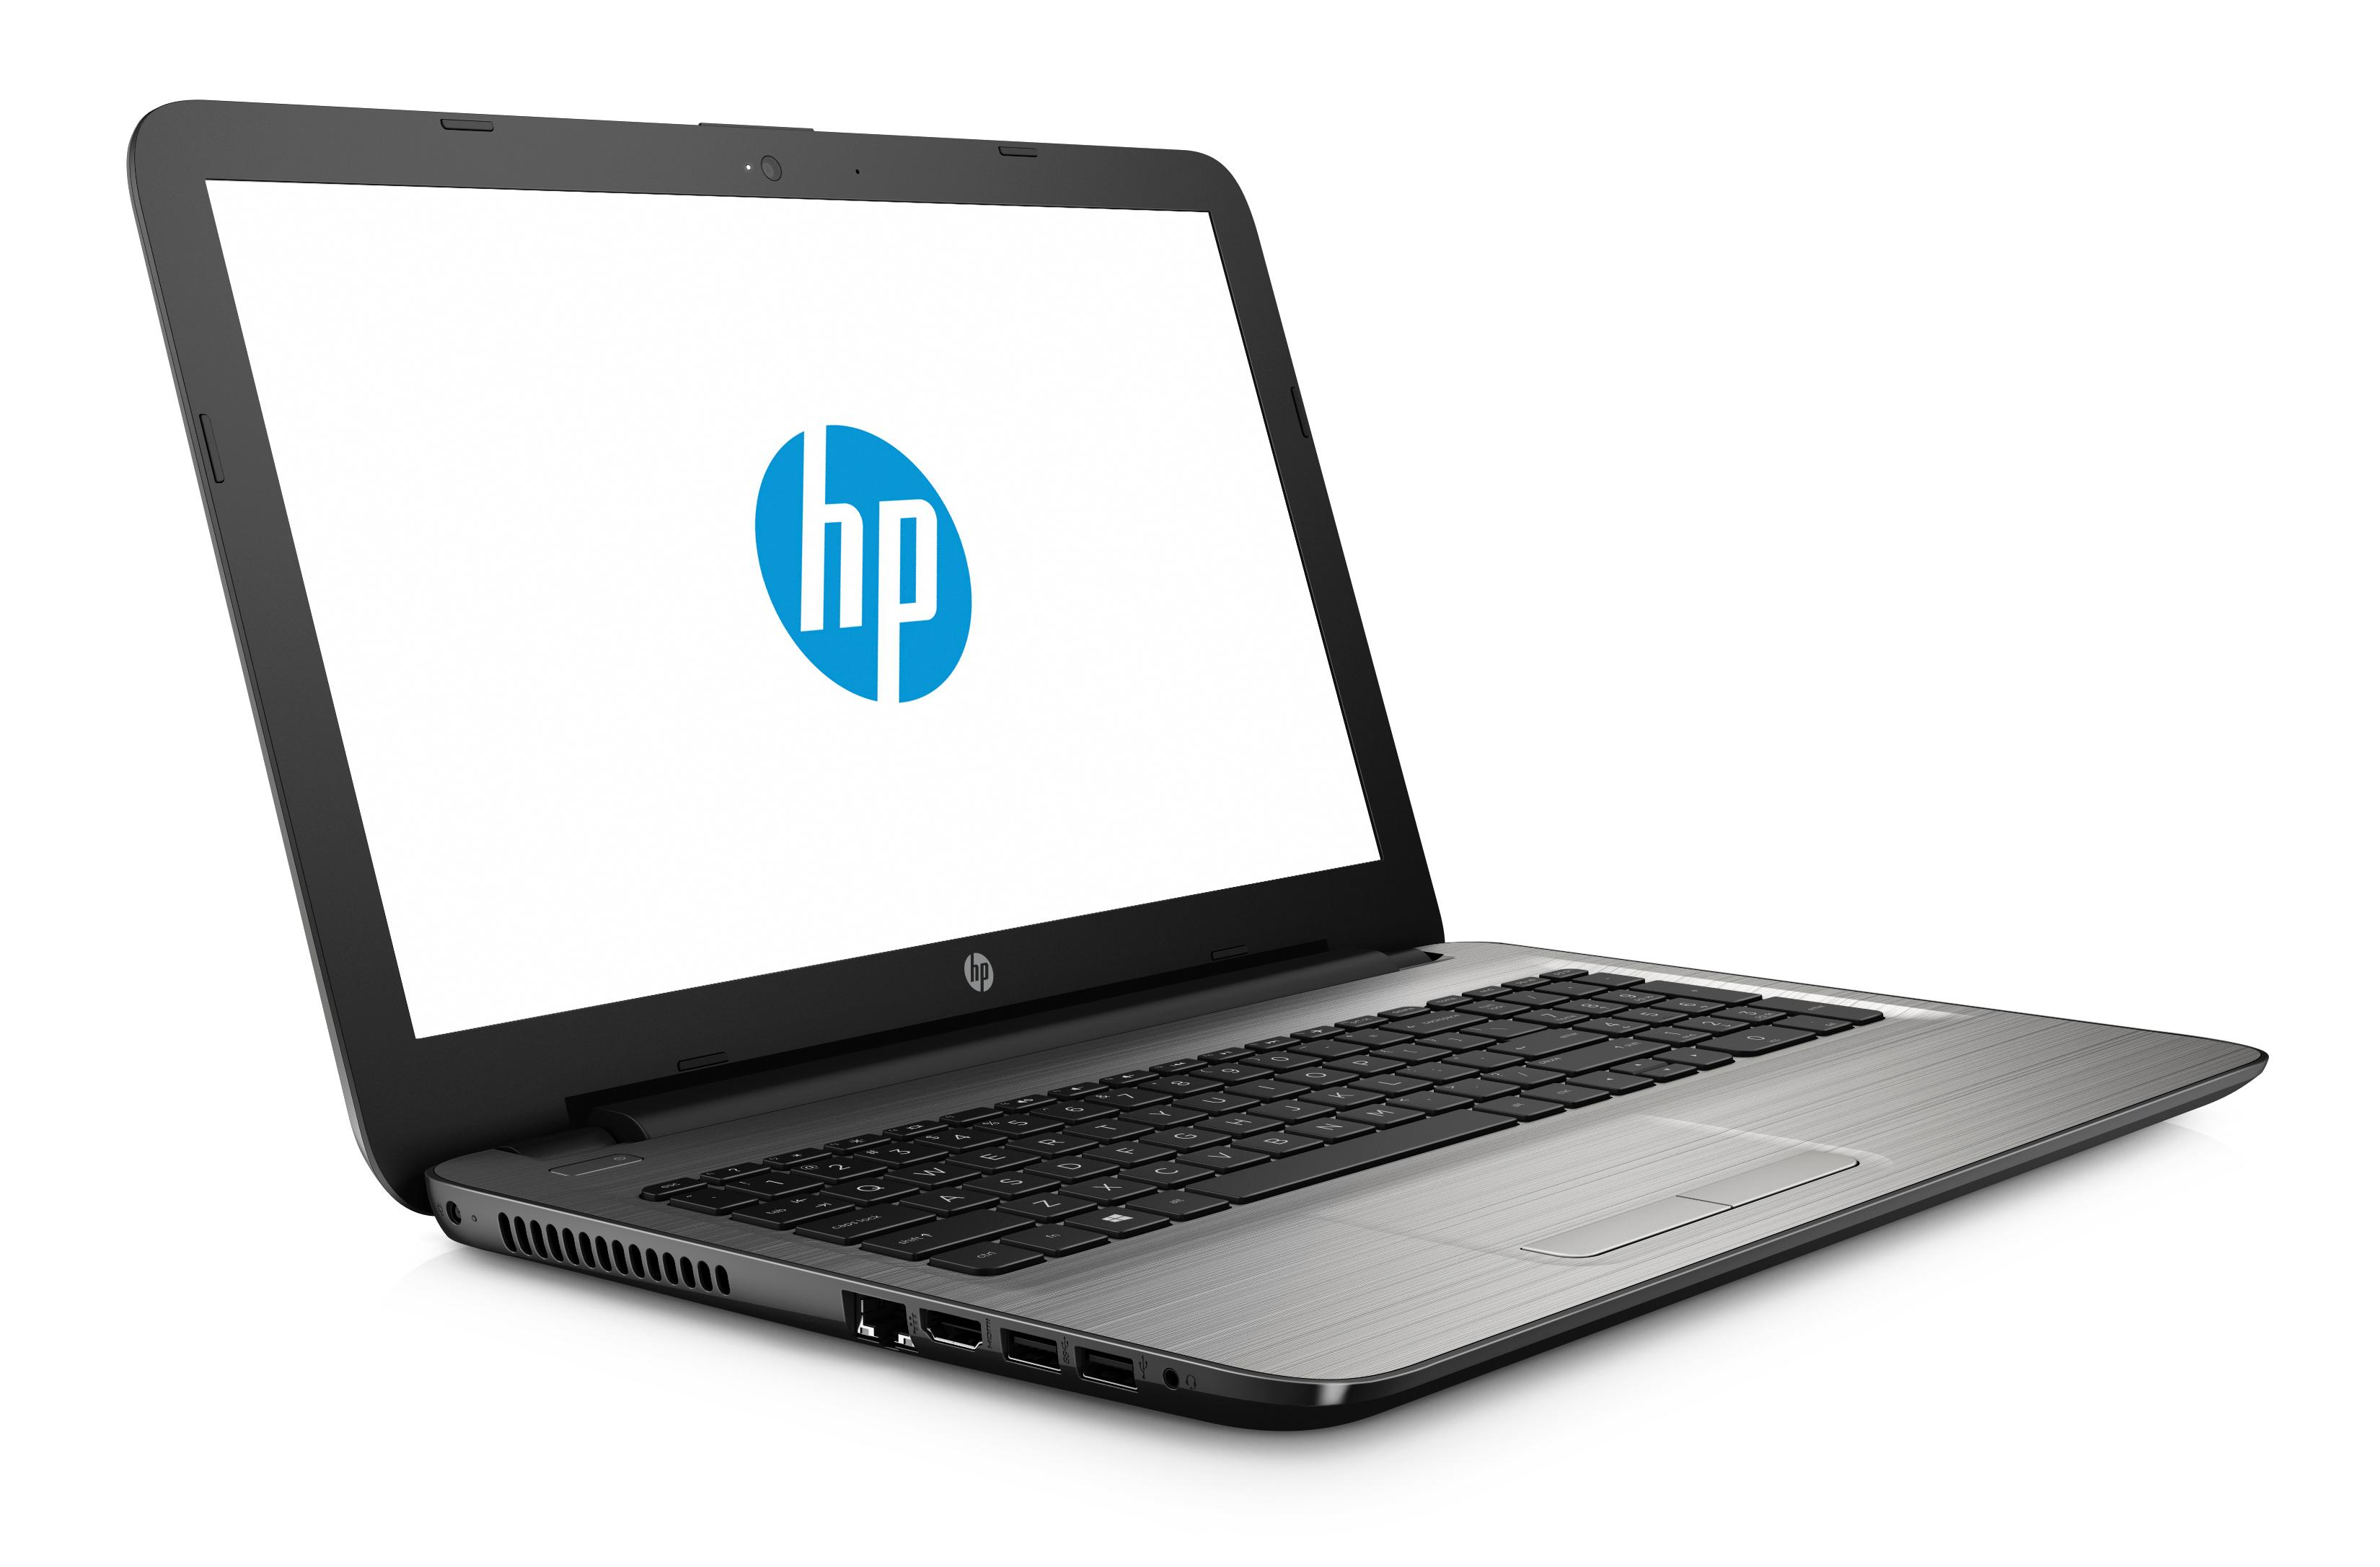 HP 15-ba100na Laptop (15.6 inch, AMD A9-9410, 8 GB RAM, 1 ...